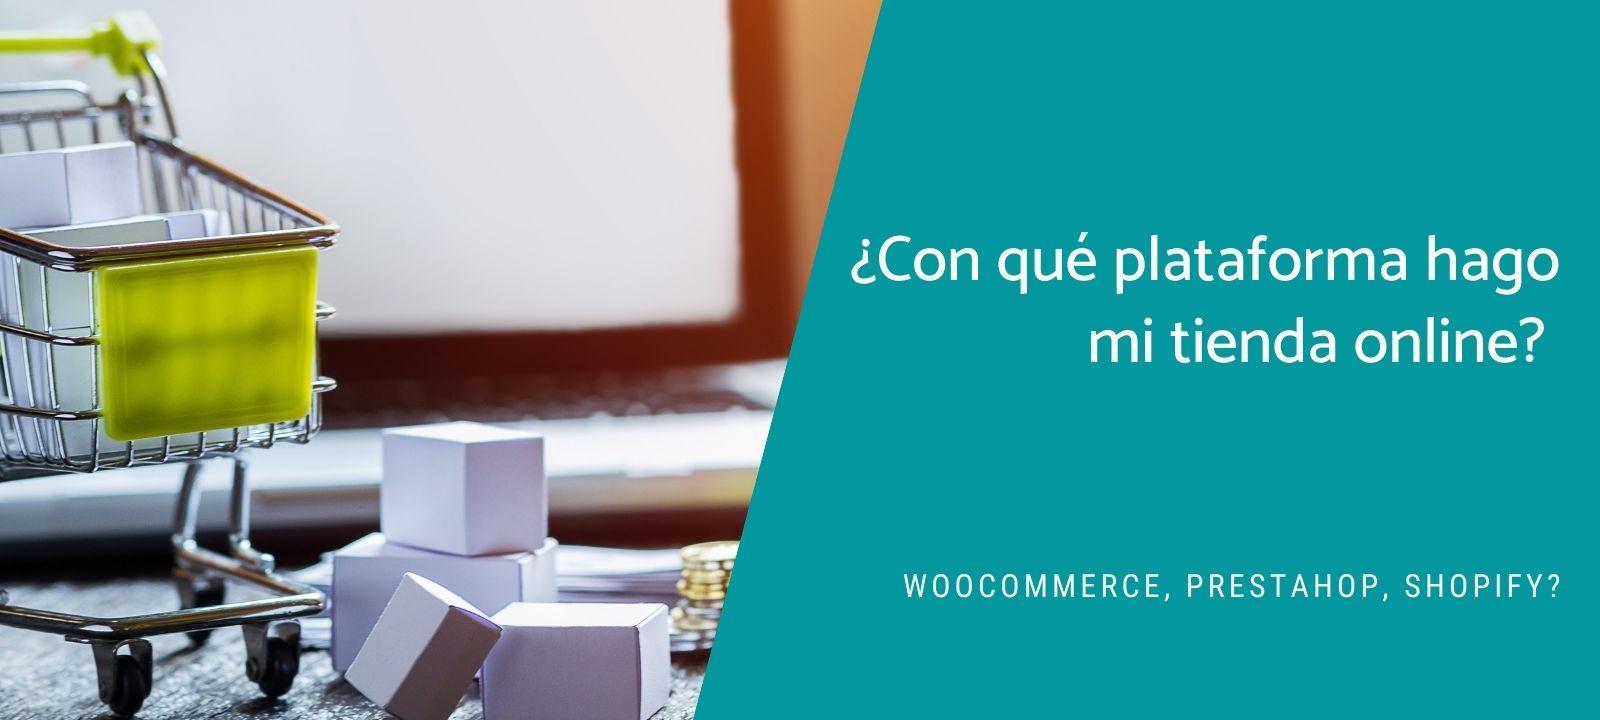 Donde hacer tu tienda online (WooCommerce, PrestaShop o Shopify)